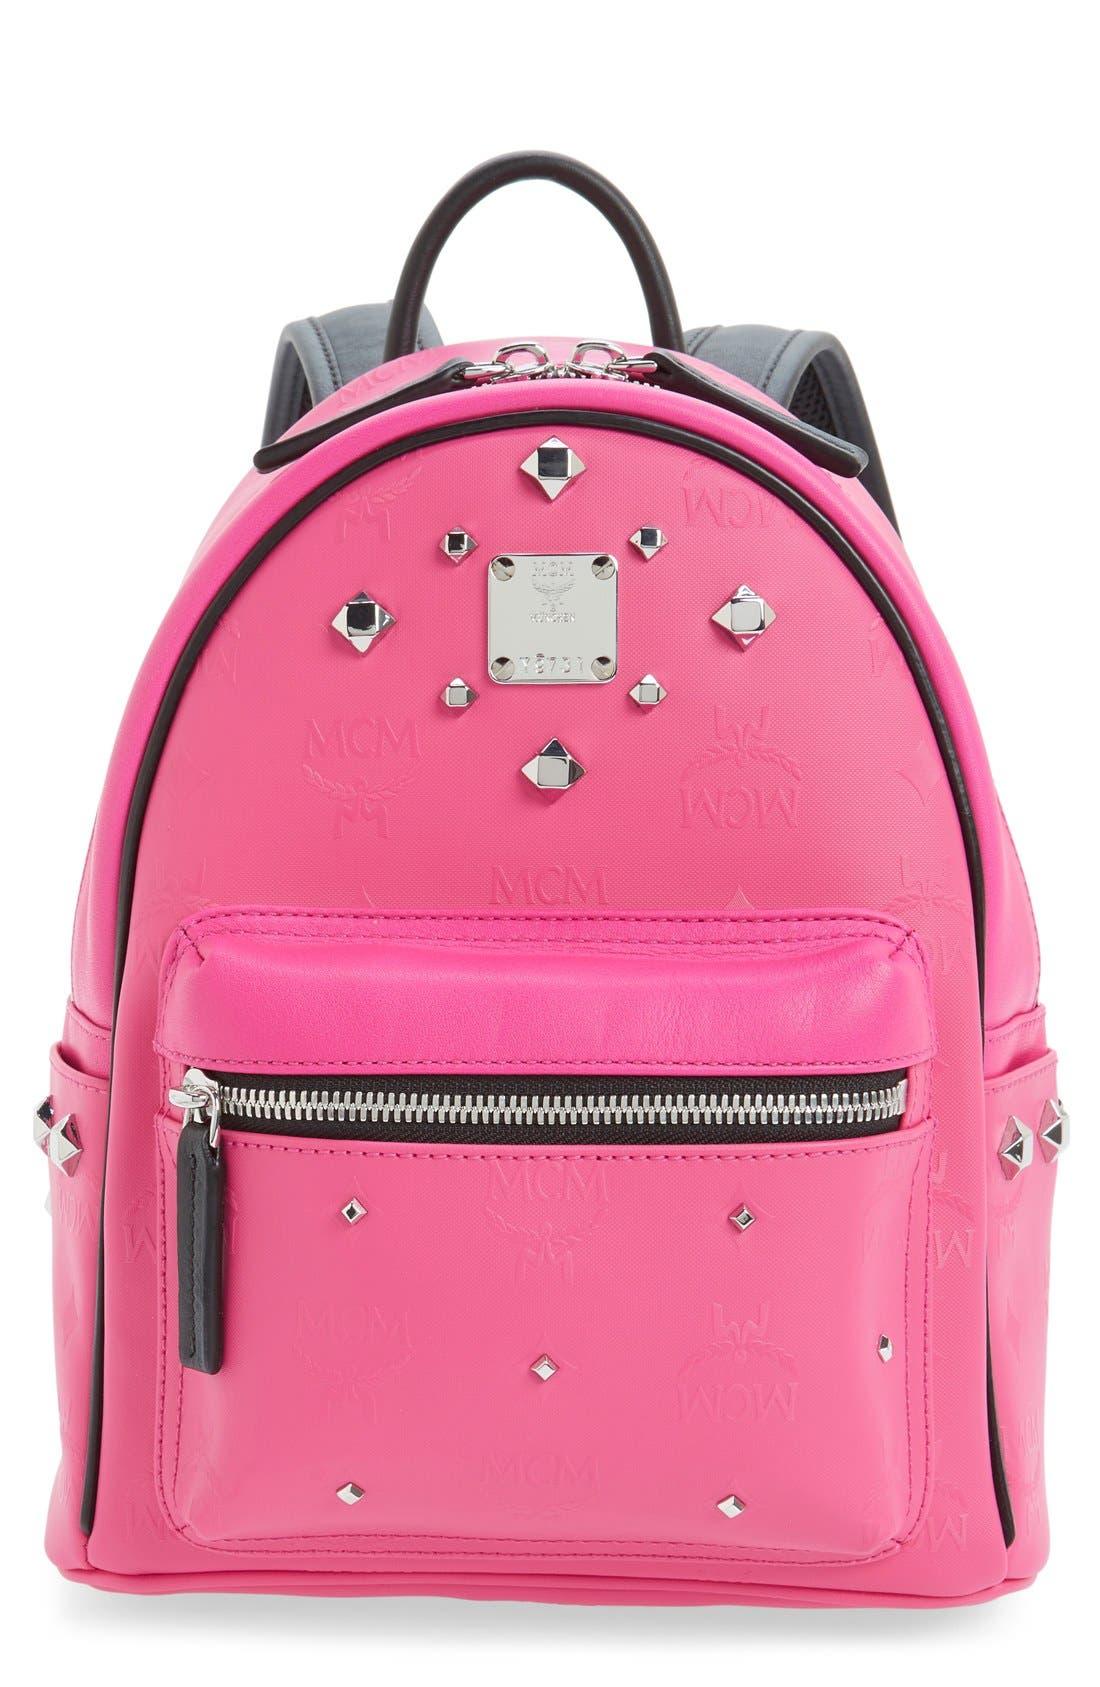 Main Image - MCM 'Mini Stark Odeon' Studded Backpack